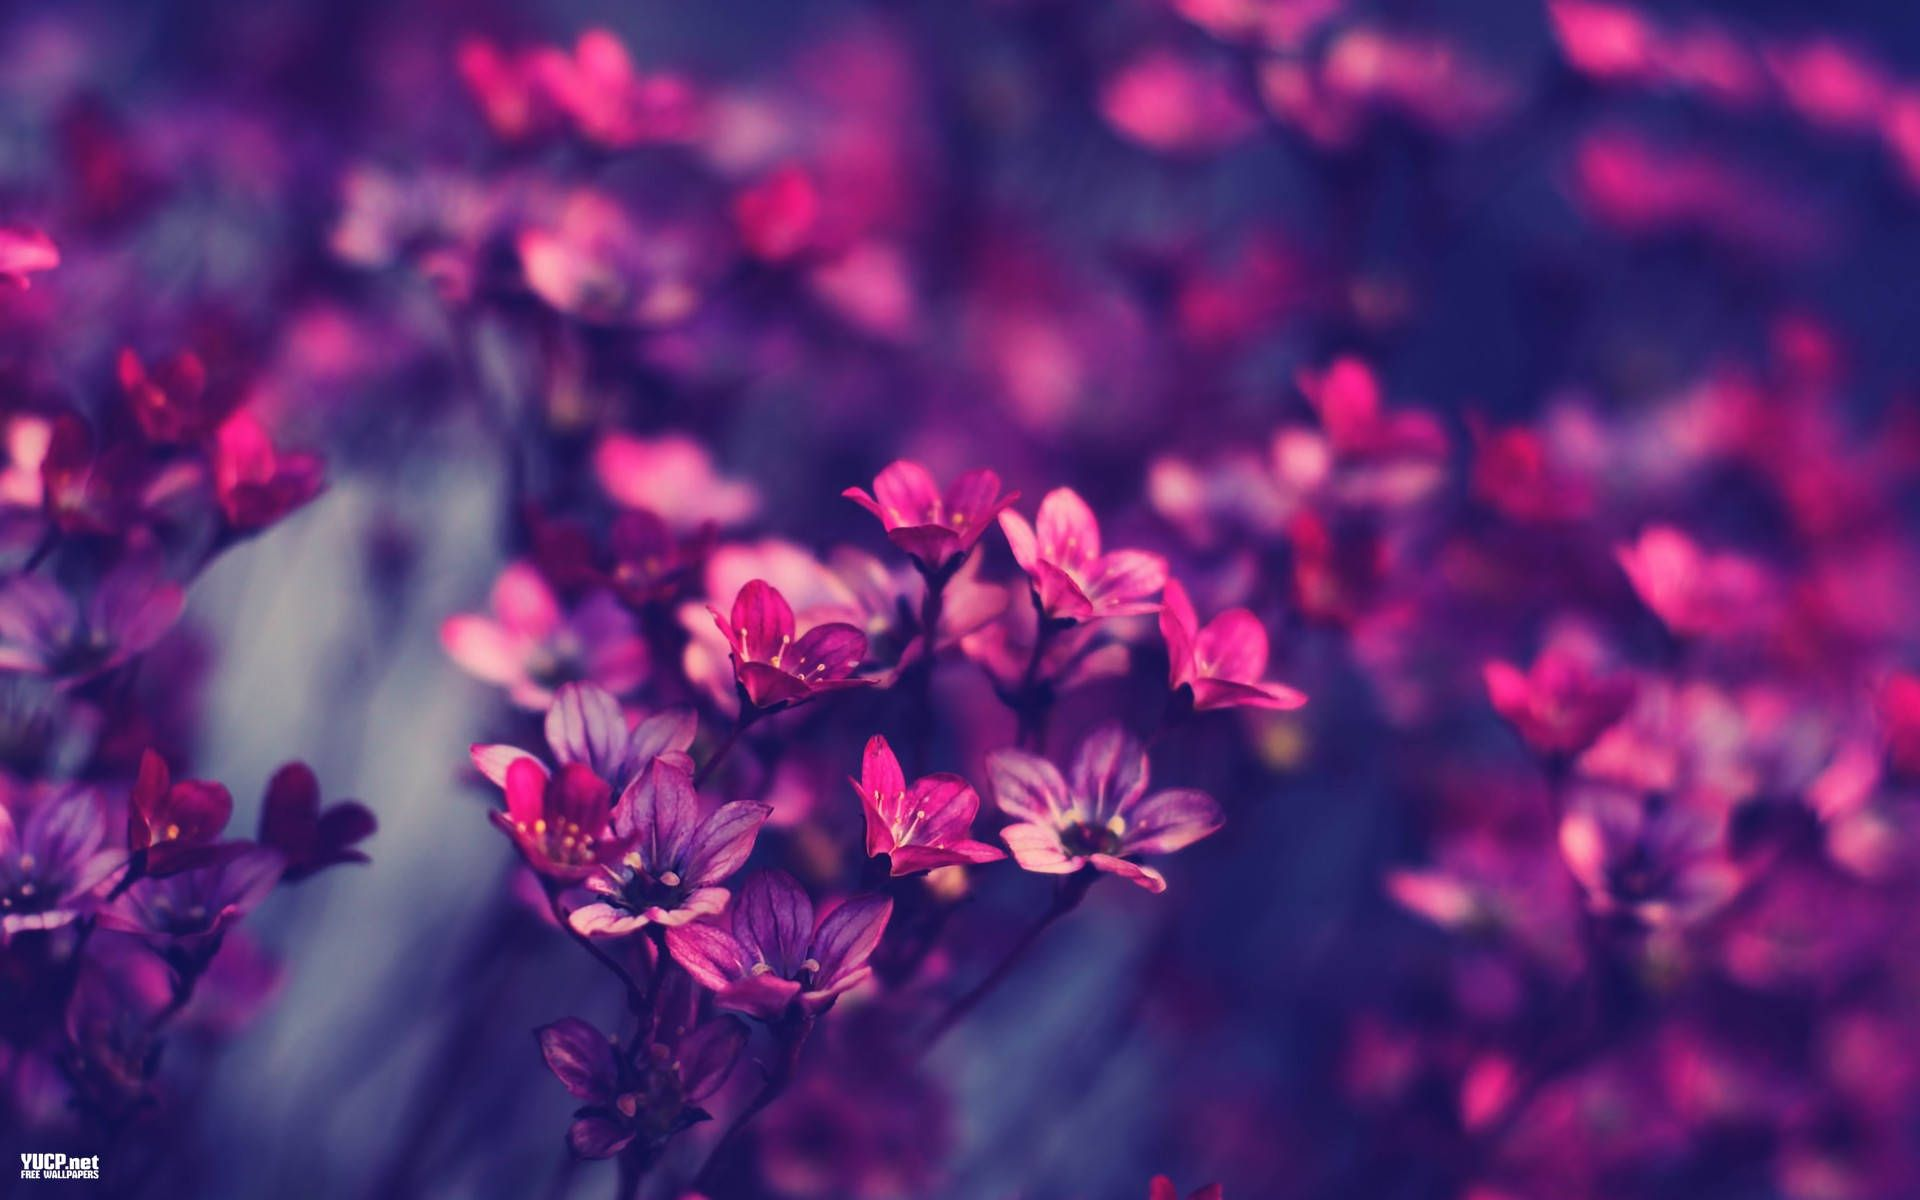 Walldiskpaper Wp Content Uploads 2014 11 Vintage Flowers Wallpaper Free Download